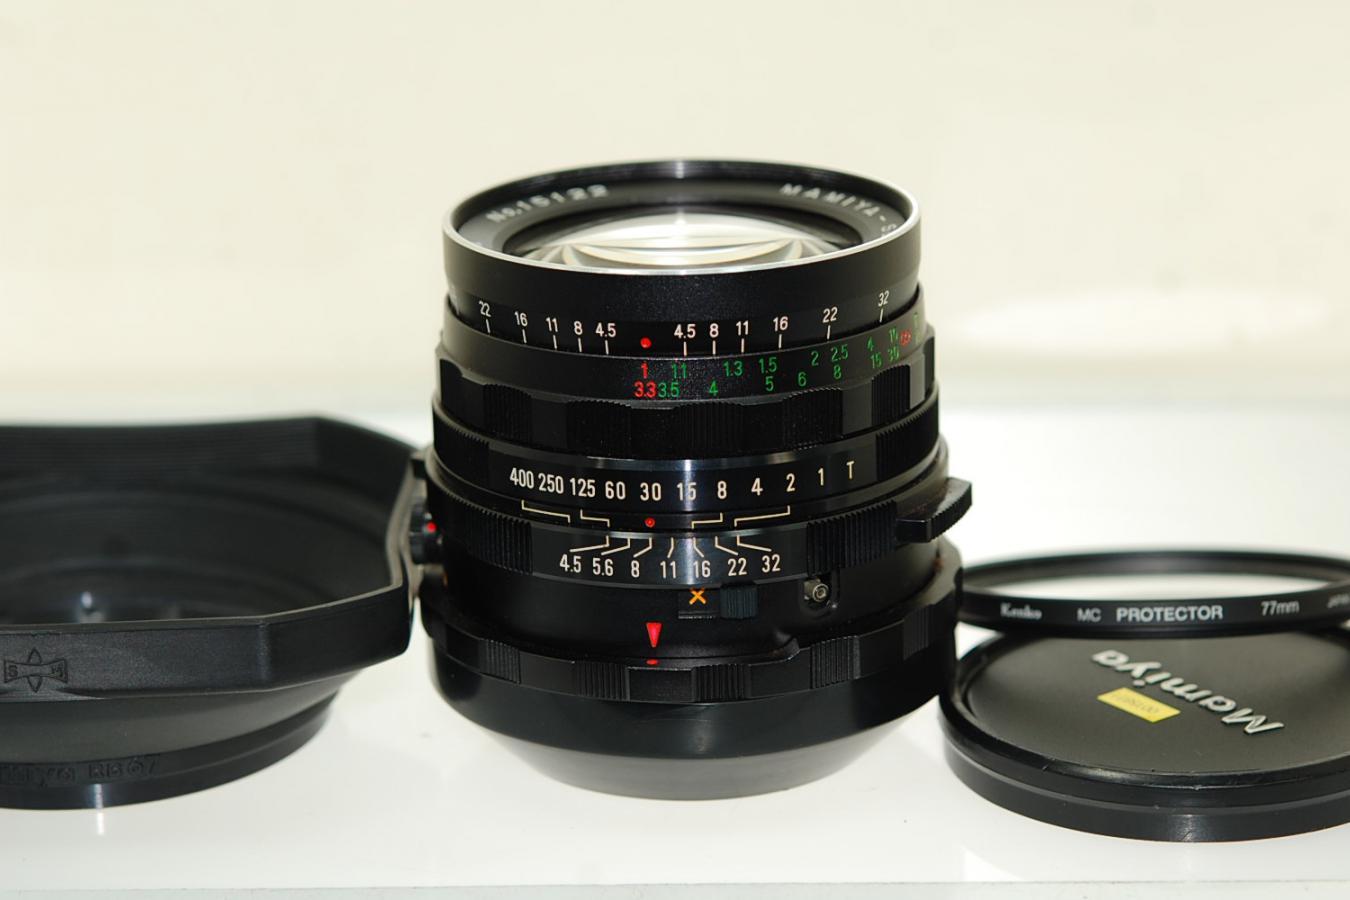 Mamiya RB67用 SEKOR 50mm F4.5 【純正フード、ケンコー製77mmMCプロテクターフィルター付】